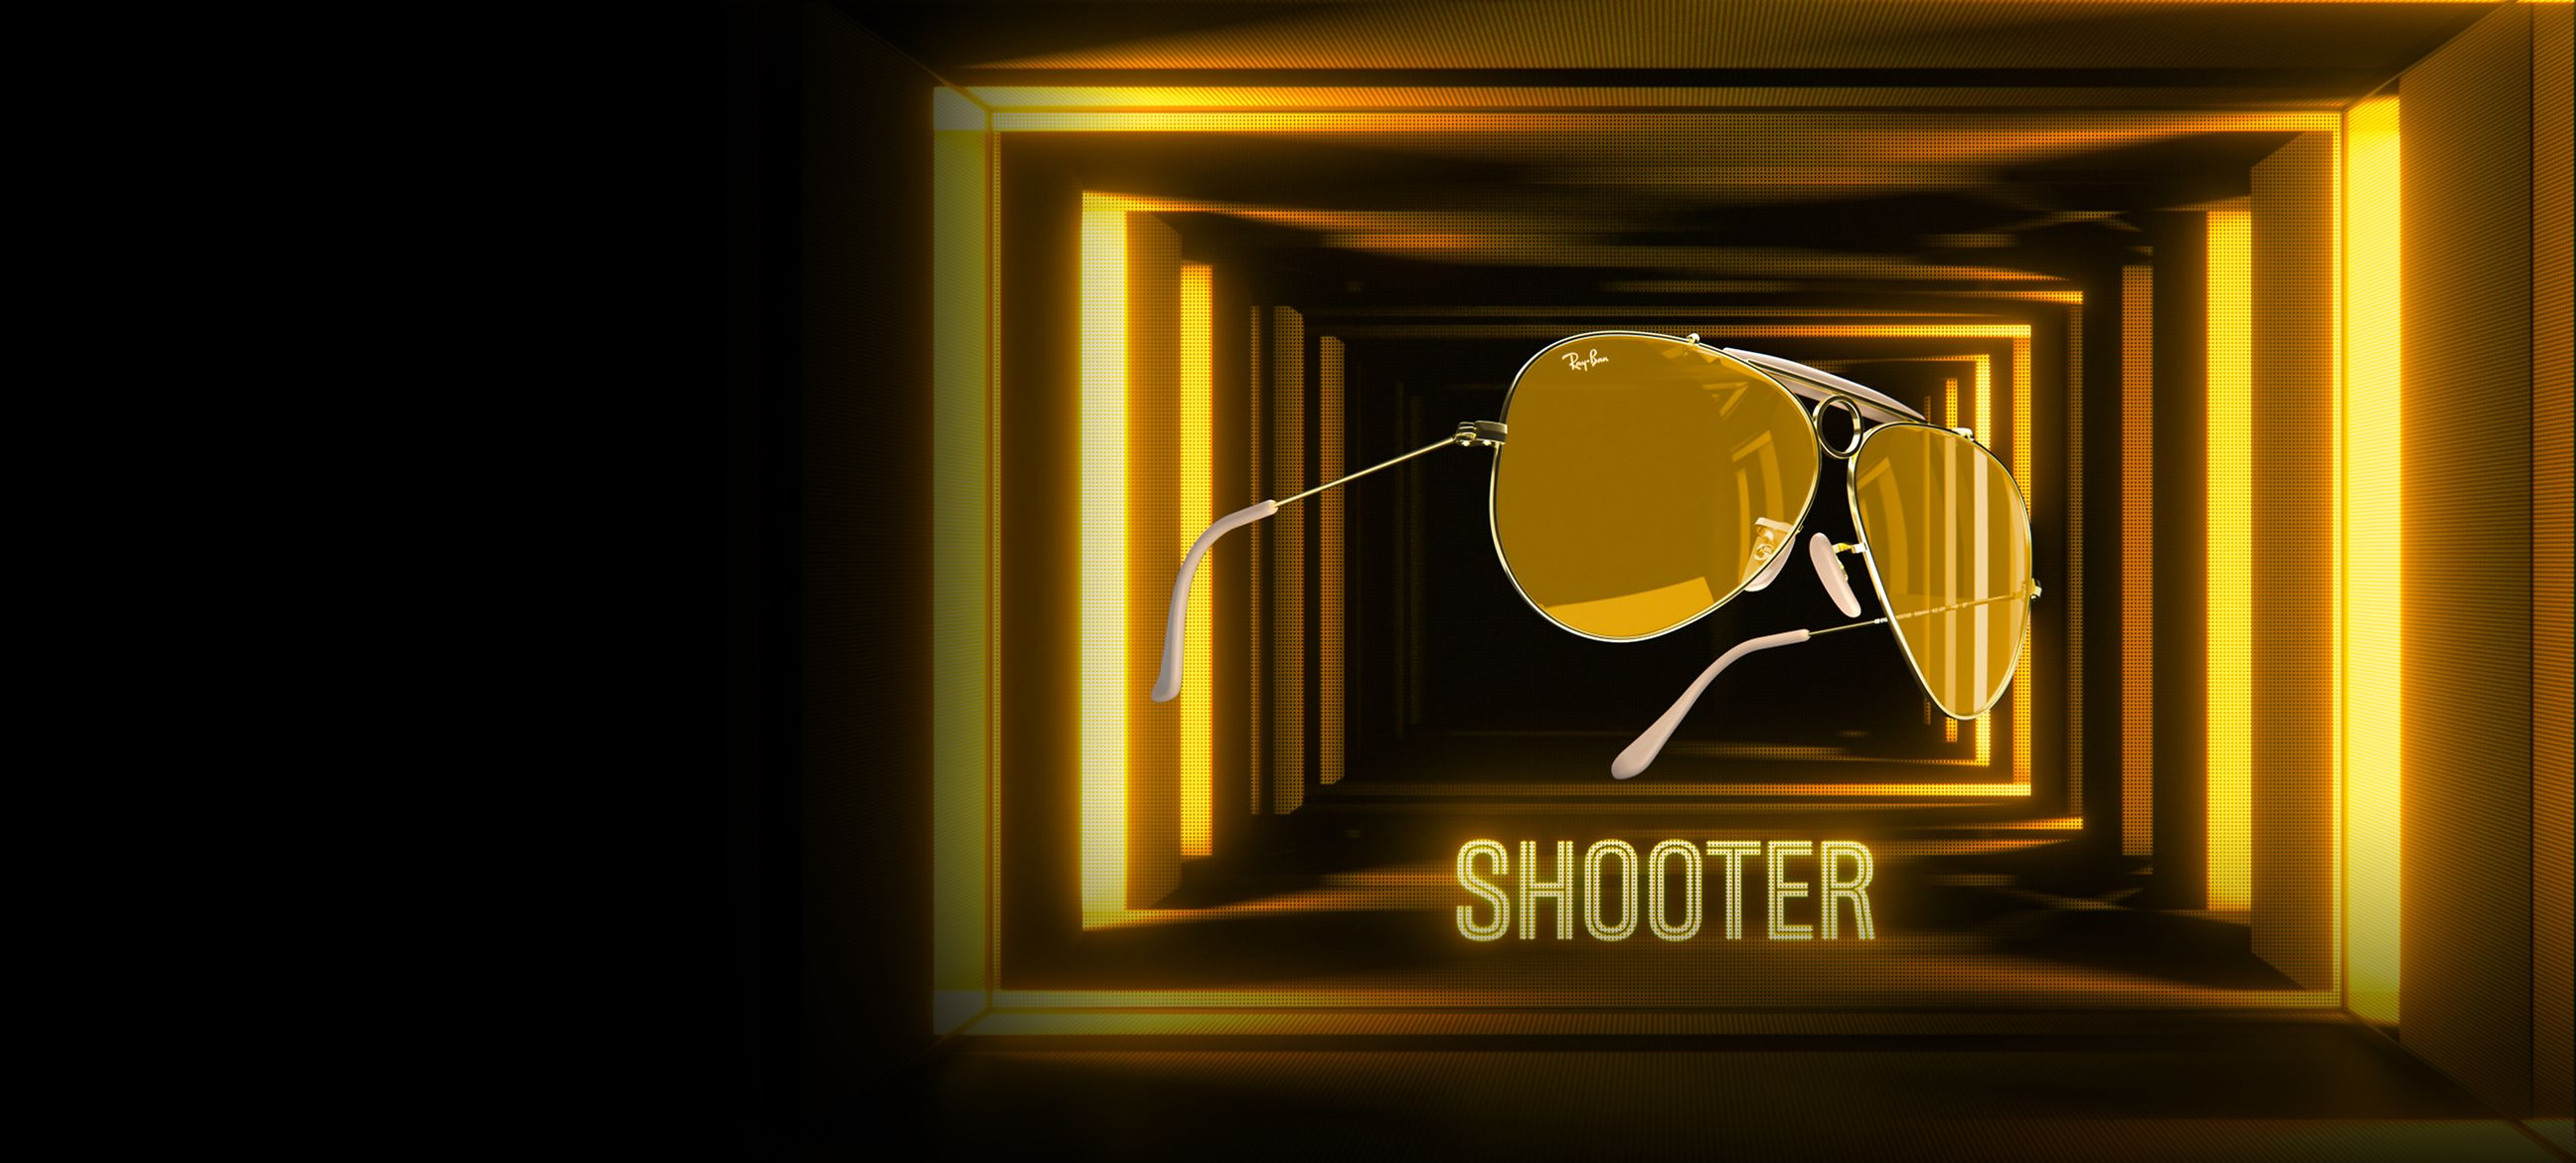 Ambermatic Shooter Ray-Ban Limited